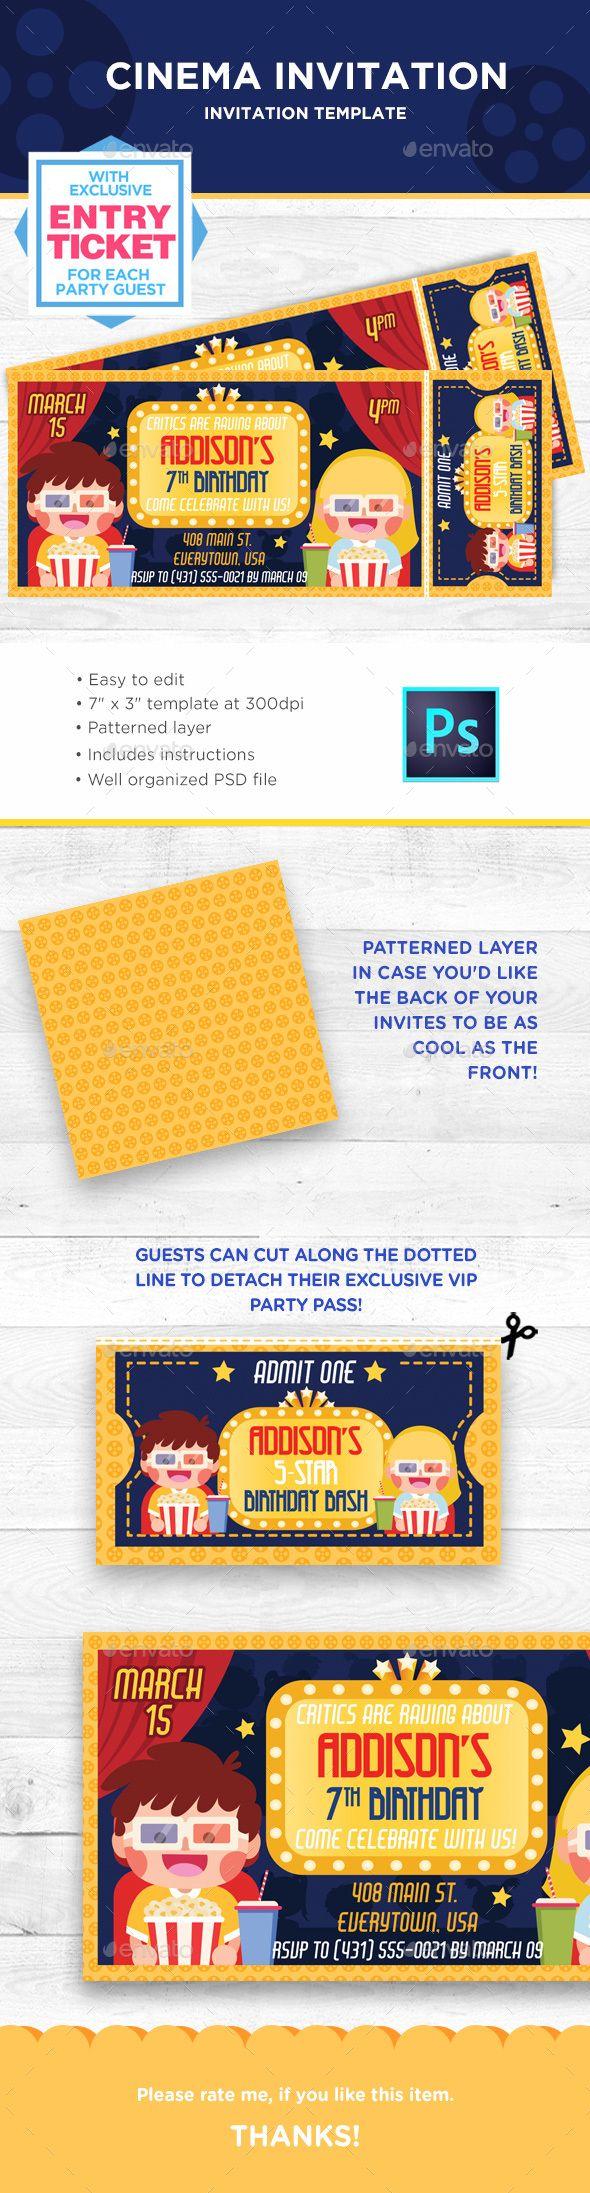 Movie Cinema Birthday Invitation | Invitation card design, Cinema ...